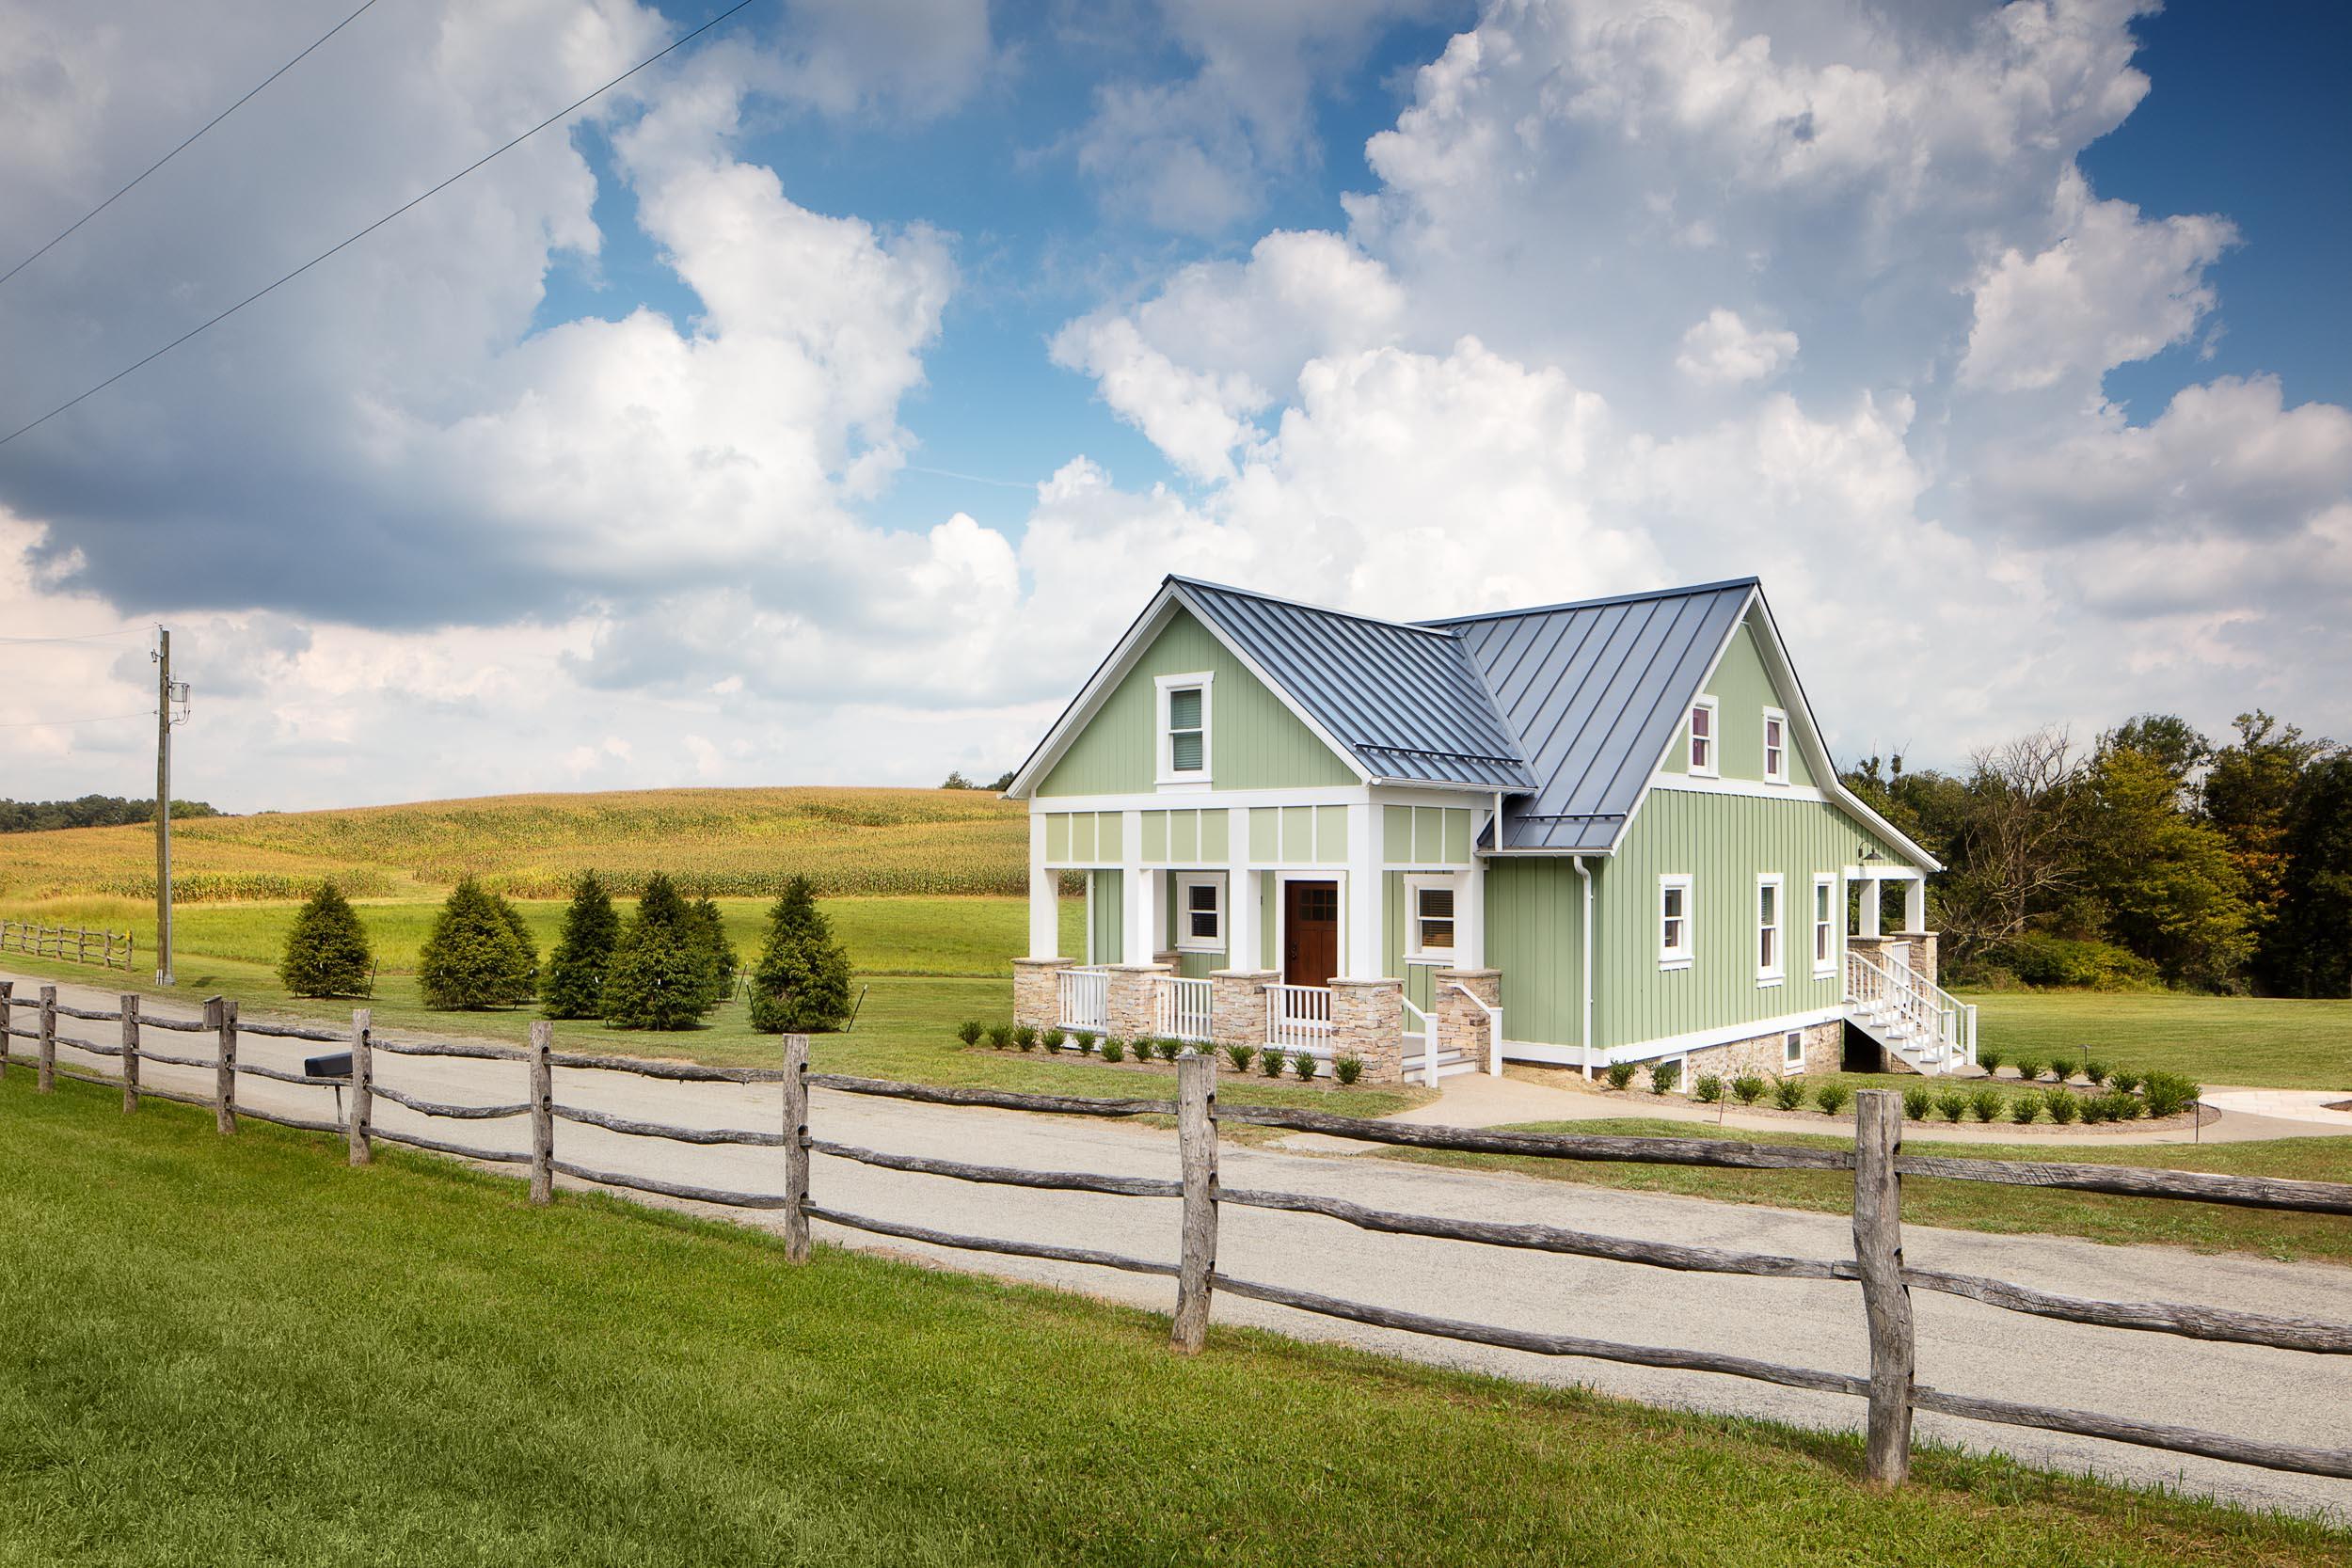 home_barn_upscale_country_grealish-10.jpg